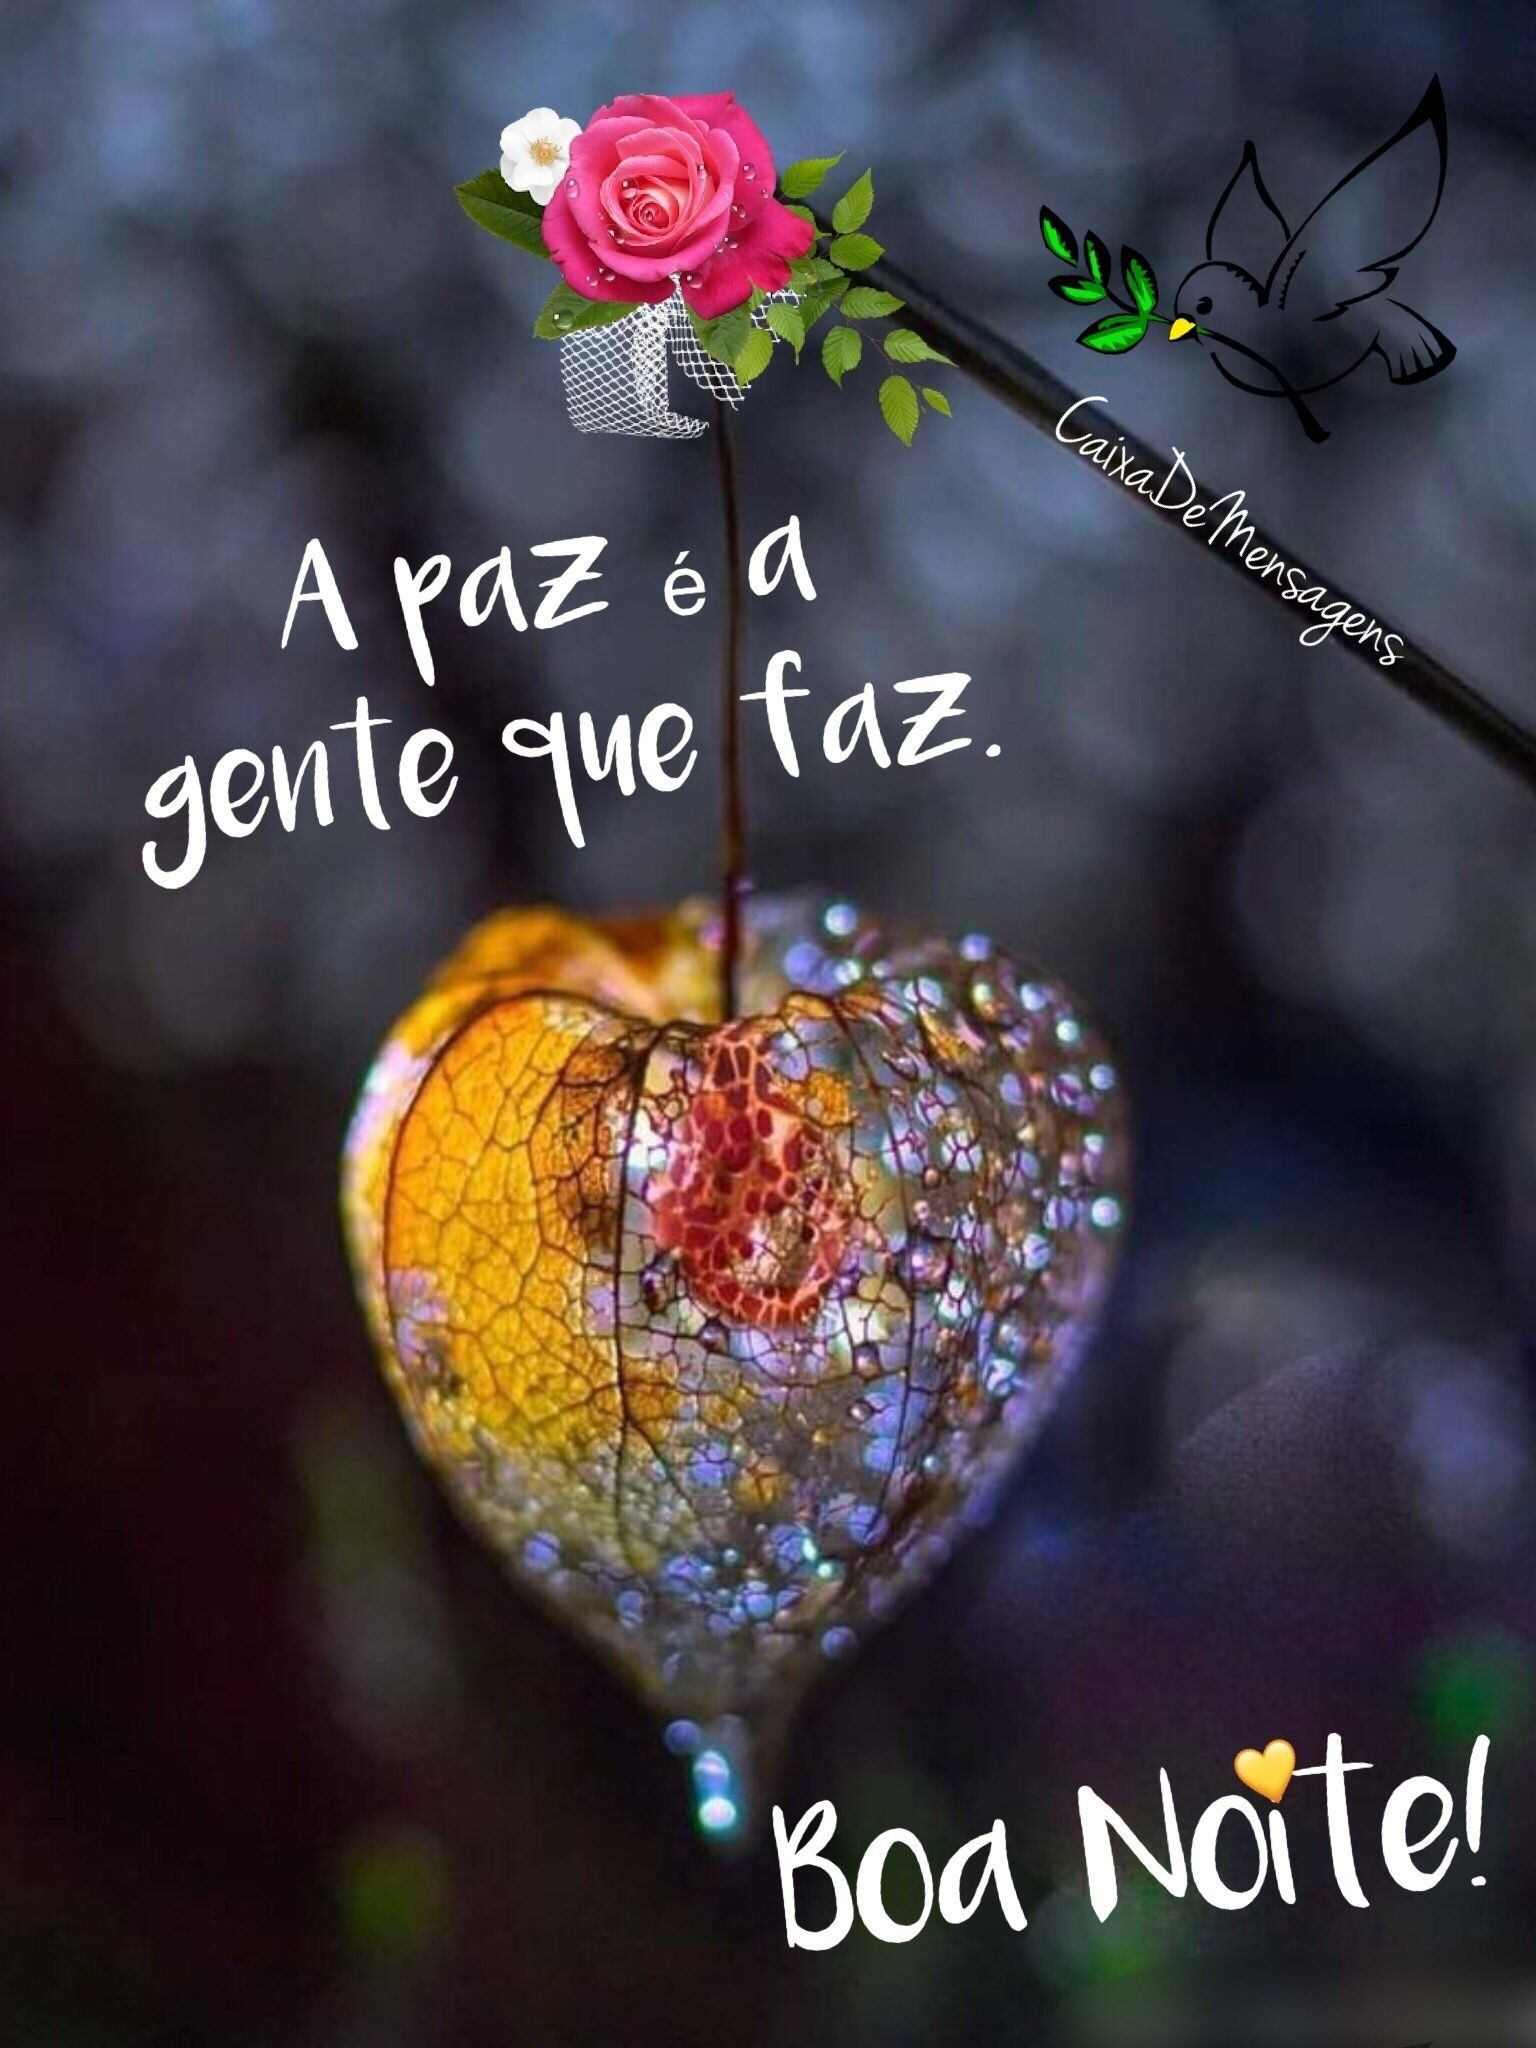 Pin De Mia Monteiro Em Frases Boa Noite Whatsapp Frases